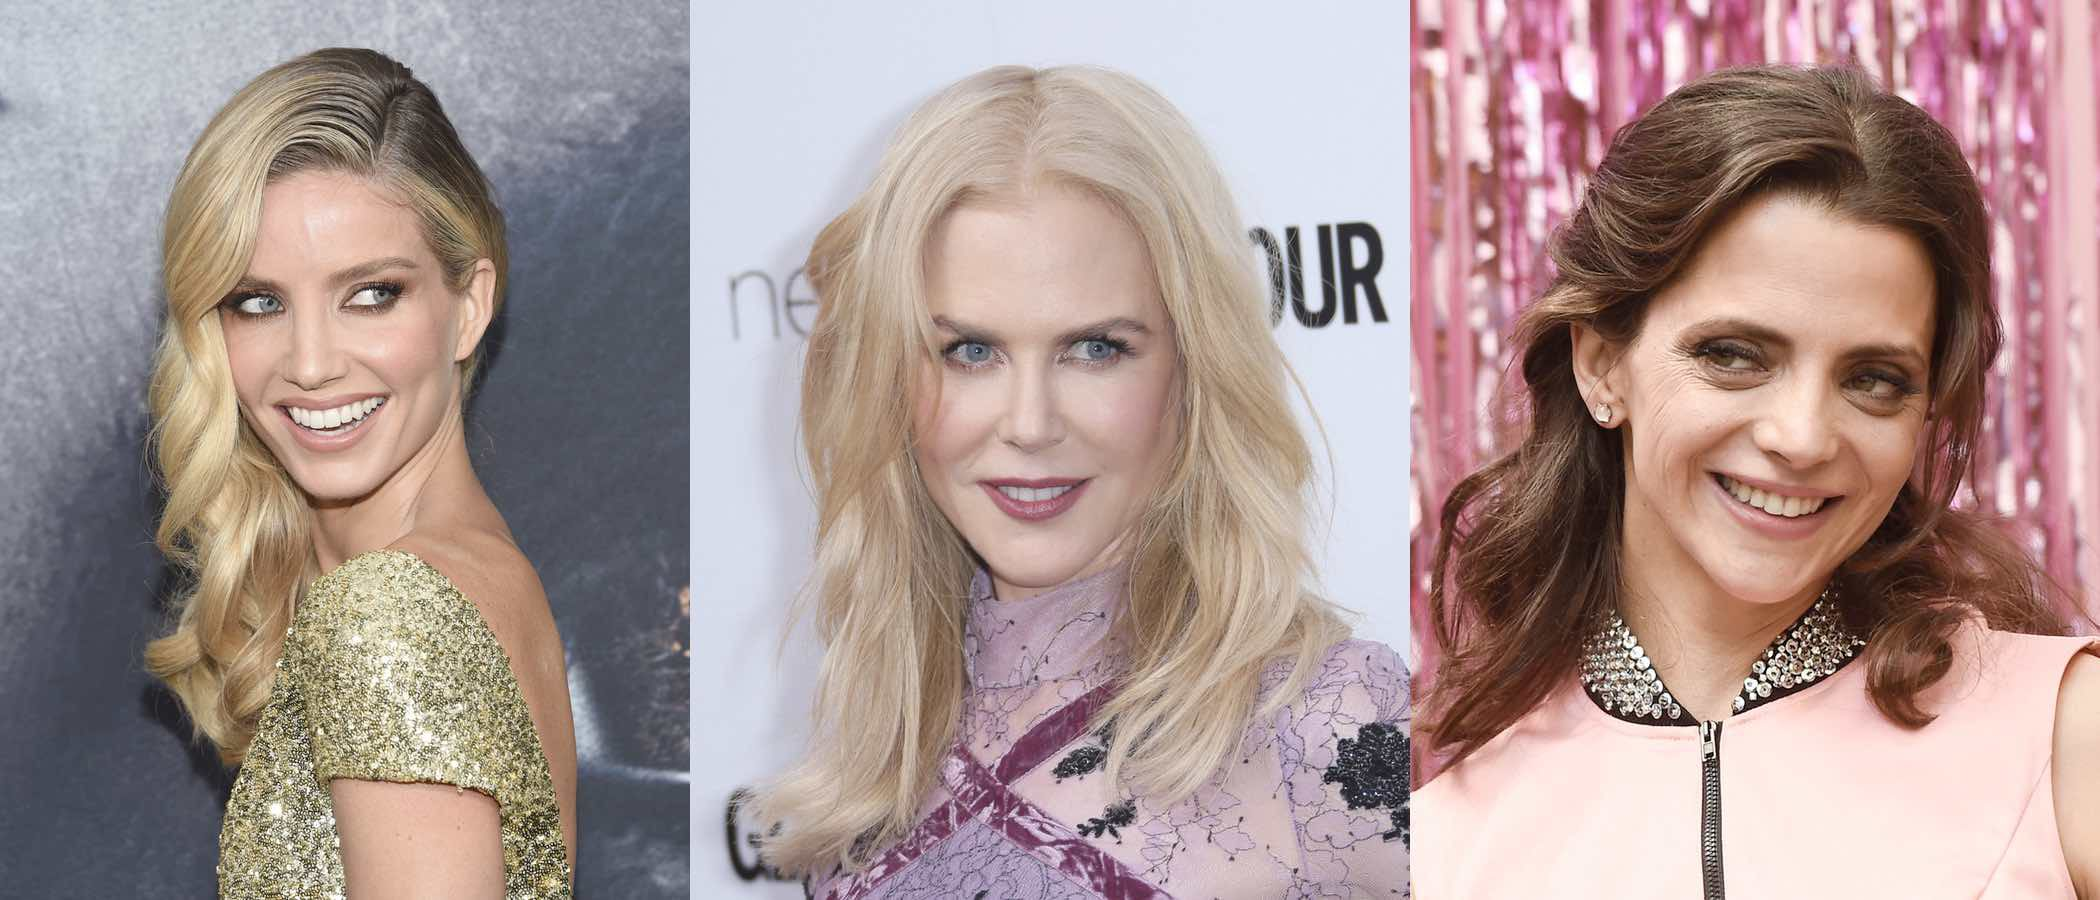 Nicole Kidman, Macarena Gómez y Anabelle Wallis, entre los mejores beauty looks de la semana